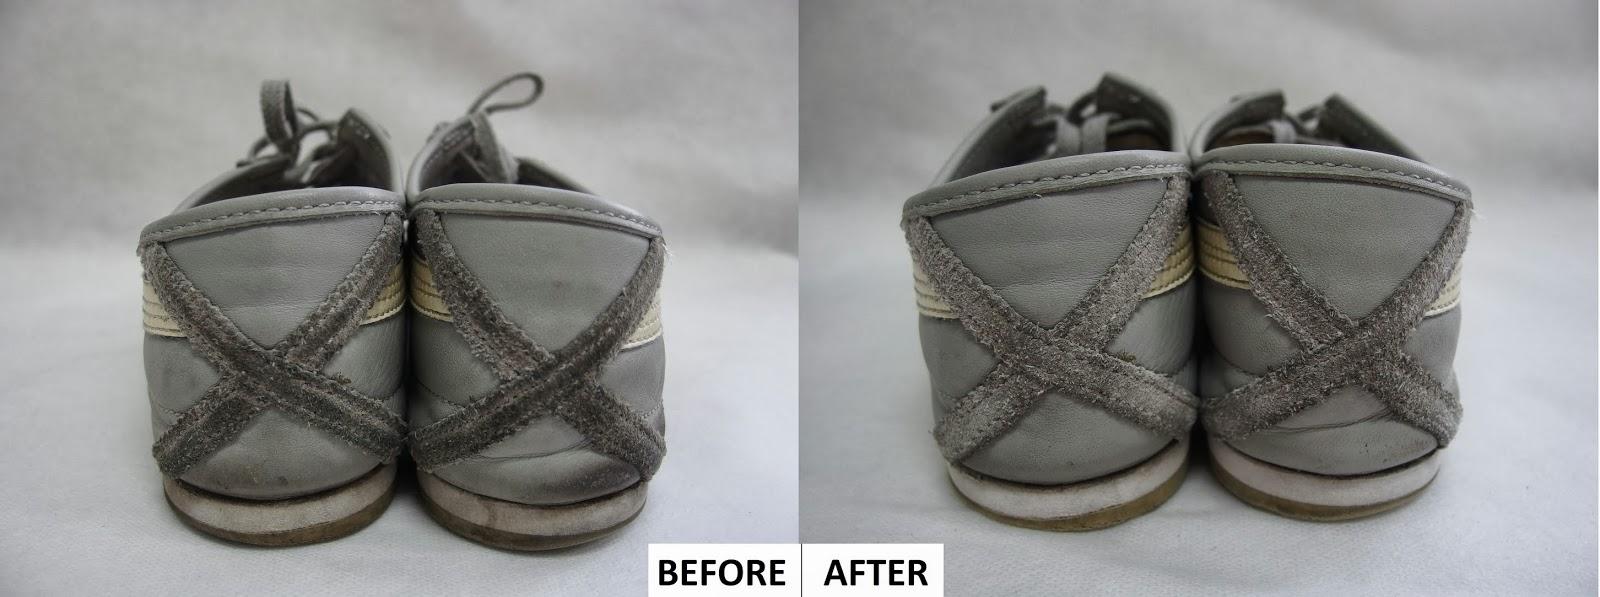 8be4702dcd5 Louis Vuitton Damier Geant Messenger Bag - Cleaning